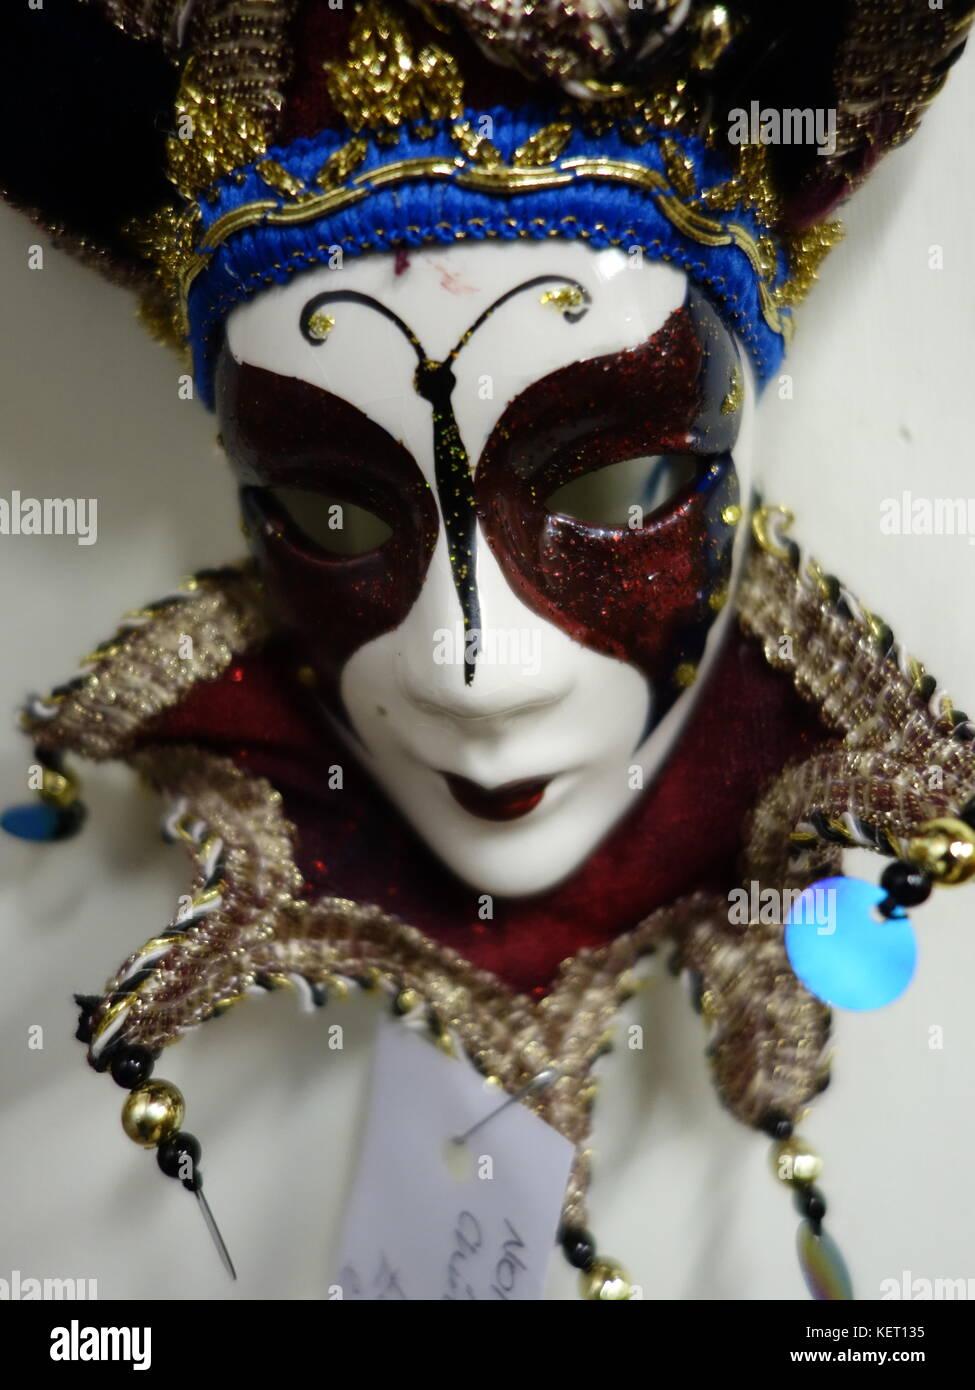 A Pierrot clown mask - Stock Image